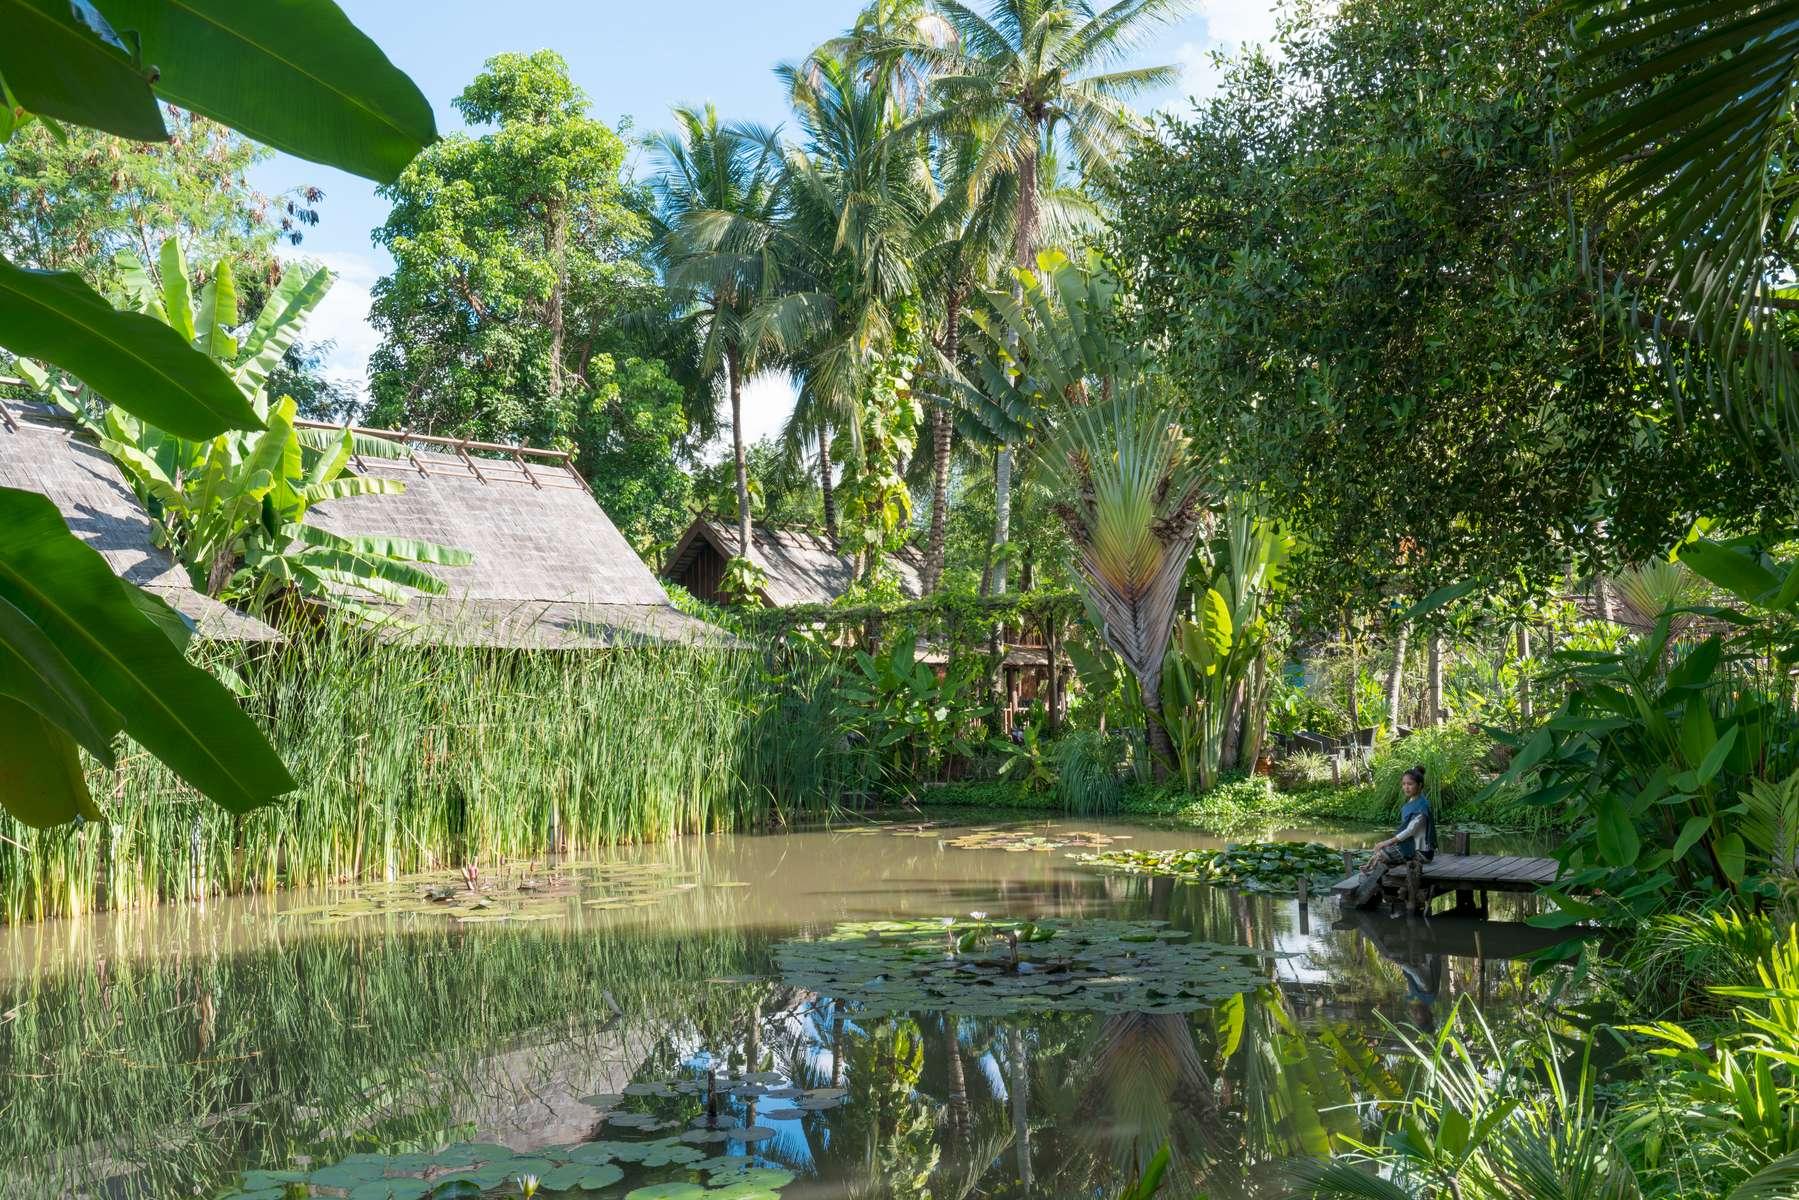 Maison_DaLaBua_Hotel_Luang_Prabang_Laos_Photo-by-Cyril-Eberle-DSC09349-copy